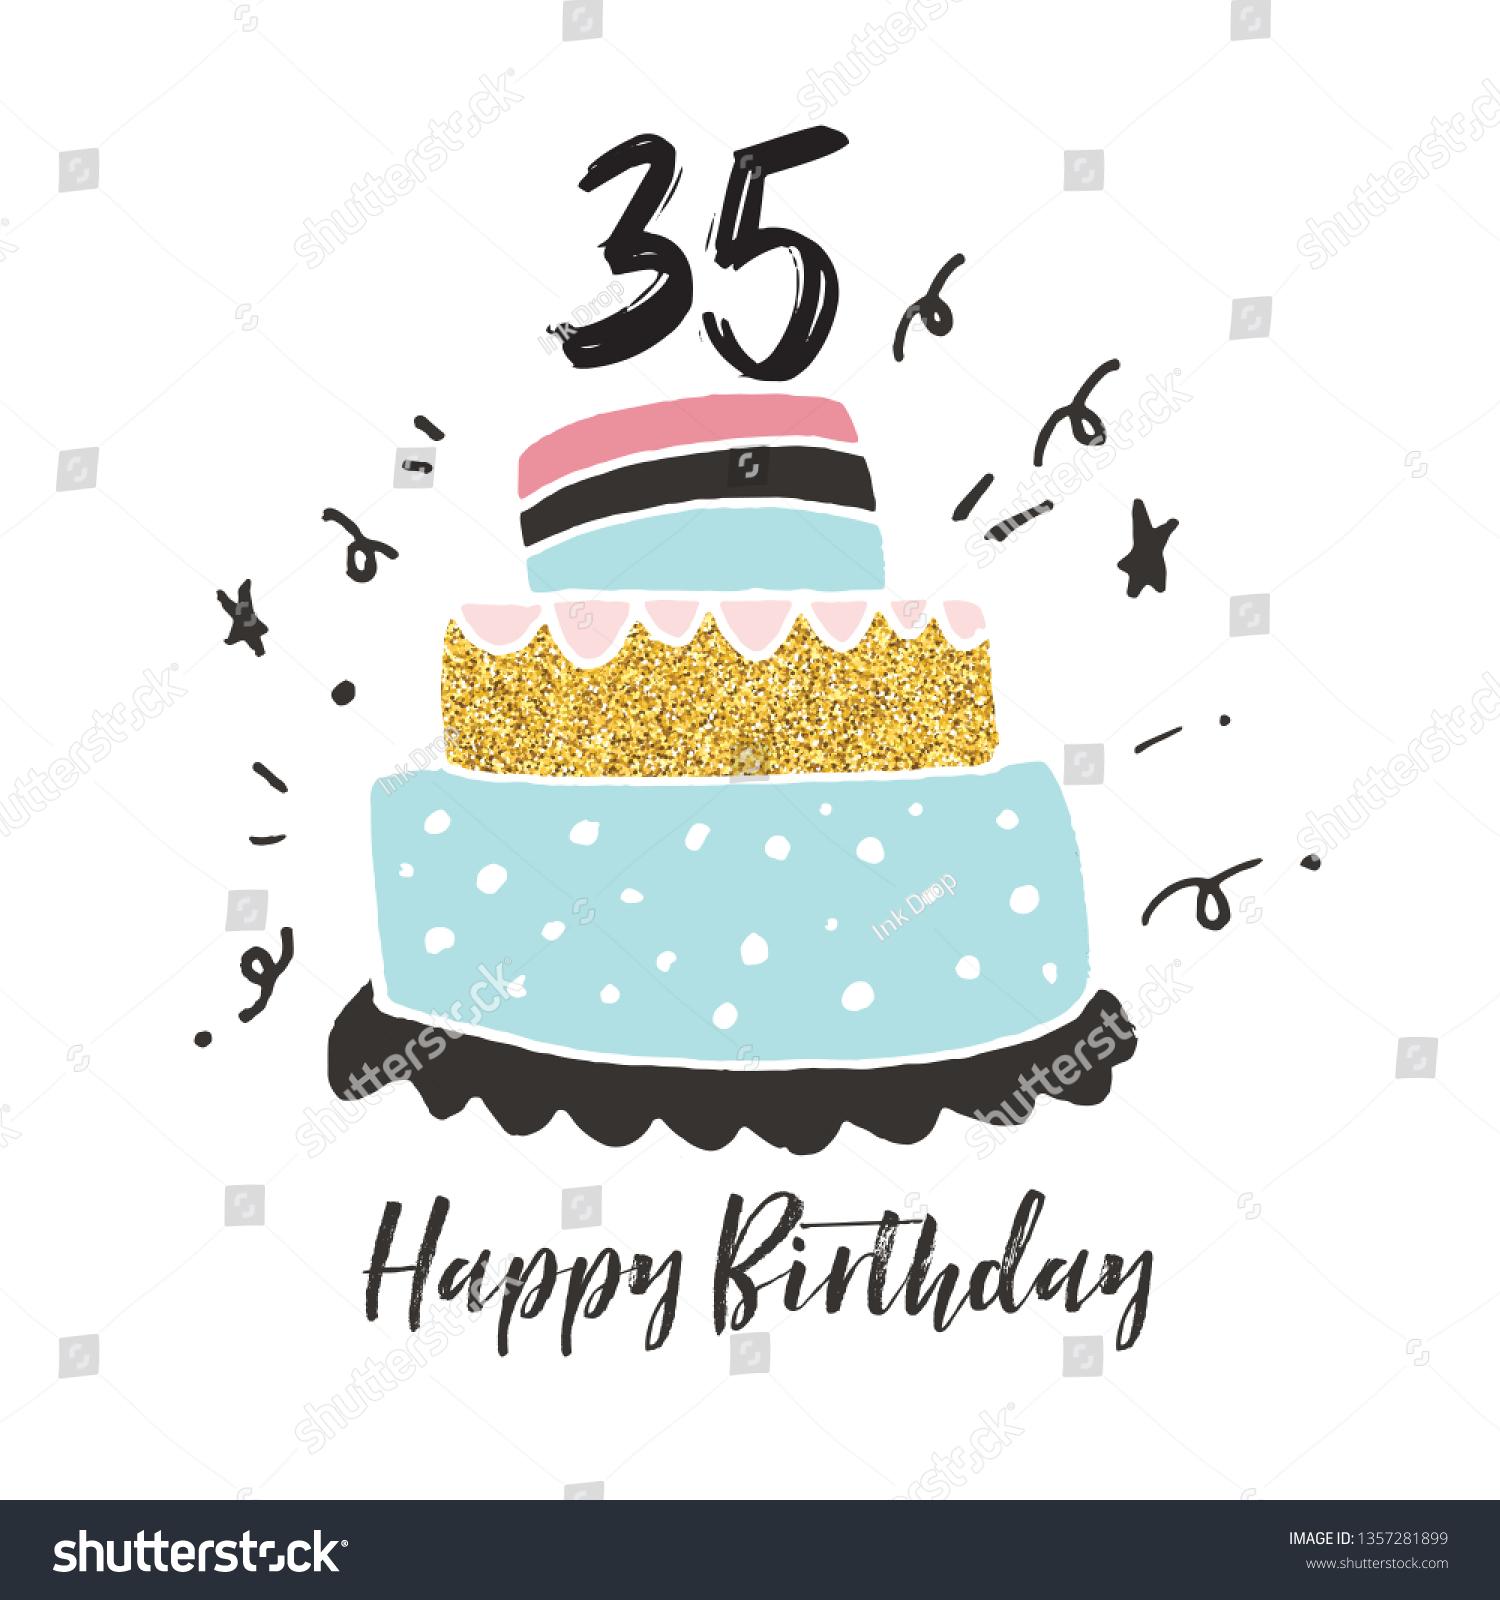 Incredible 35Th Birthday Hand Drawn Cake Birthday Stock Vector Royalty Free Personalised Birthday Cards Sponlily Jamesorg